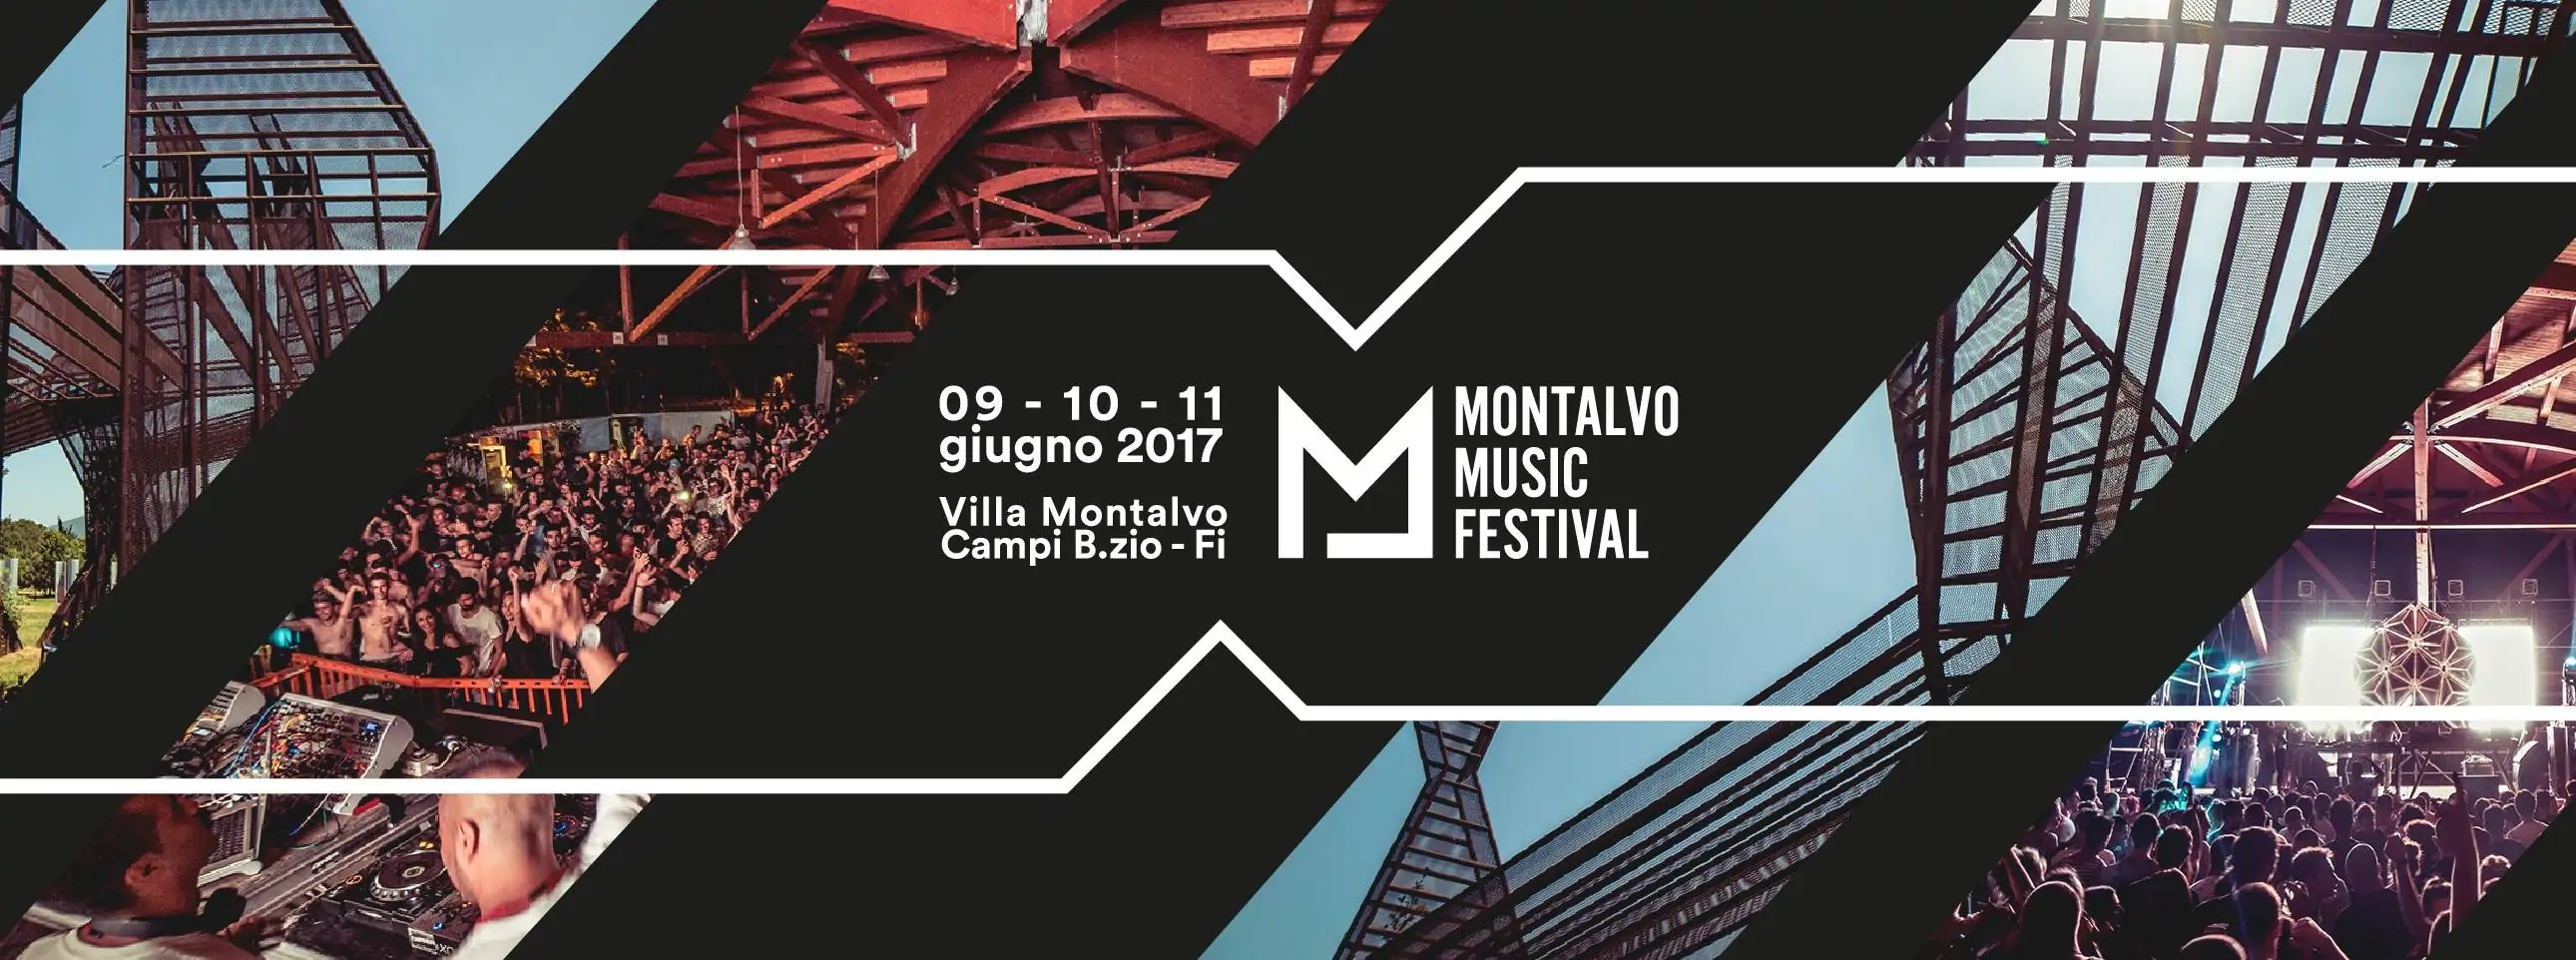 Montalvo Music Festival 2017 FIRENZE + Prezzi Ticket Prevendite Biglietti Tavoli Liste Pacchetti Hotel